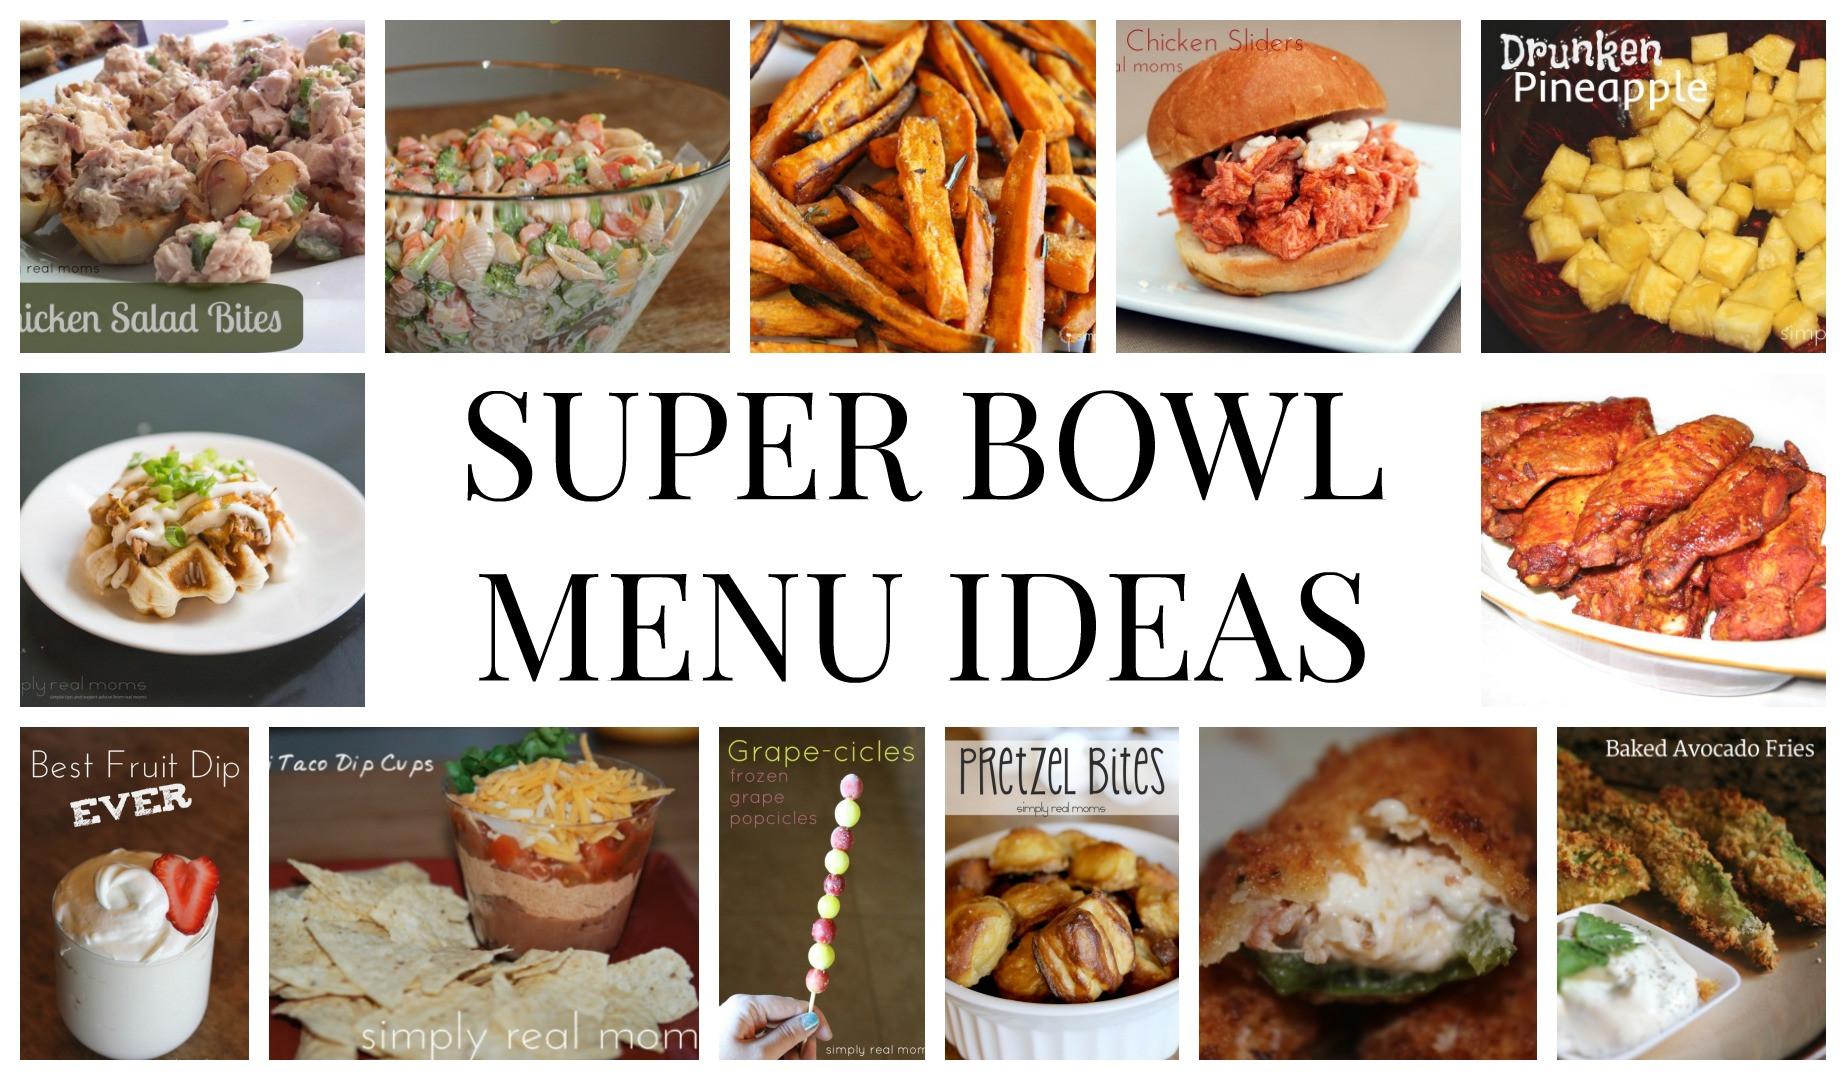 Super Bowl Dinner Ideas  latest super bowl sunday menu ideas with menu ideas